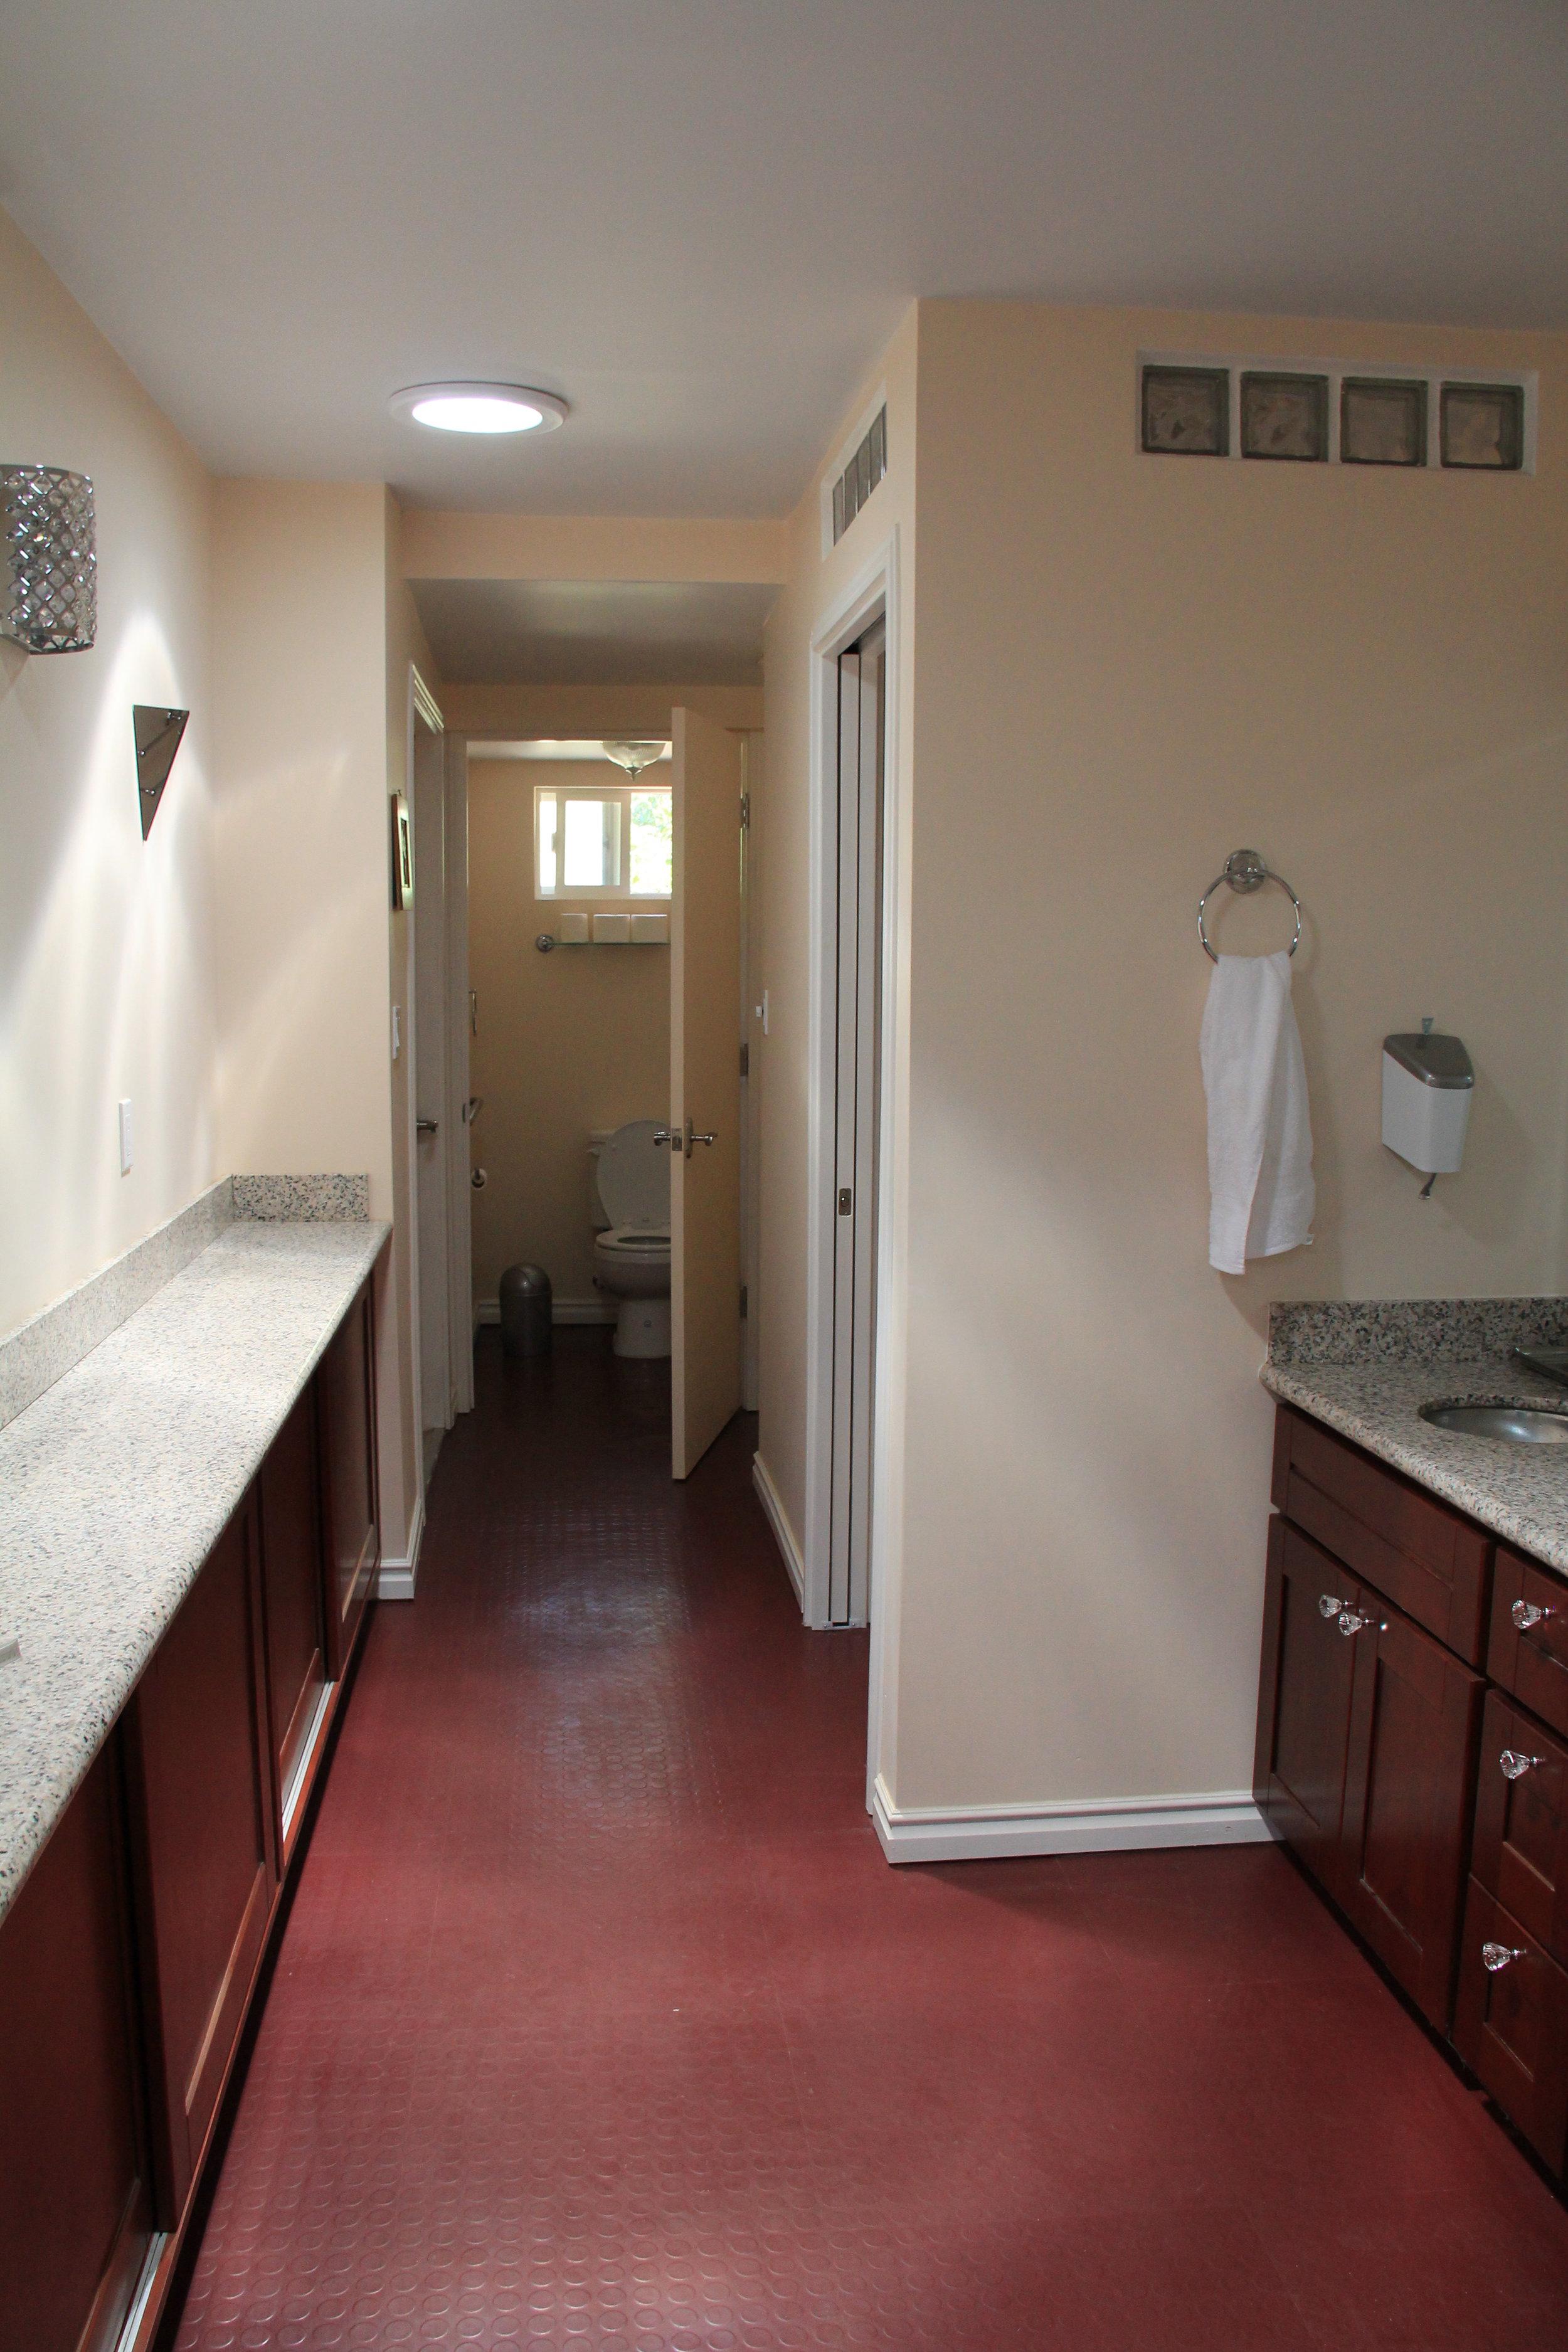 Clean, well-lit Lodge bathroom is wheelchair-friendly